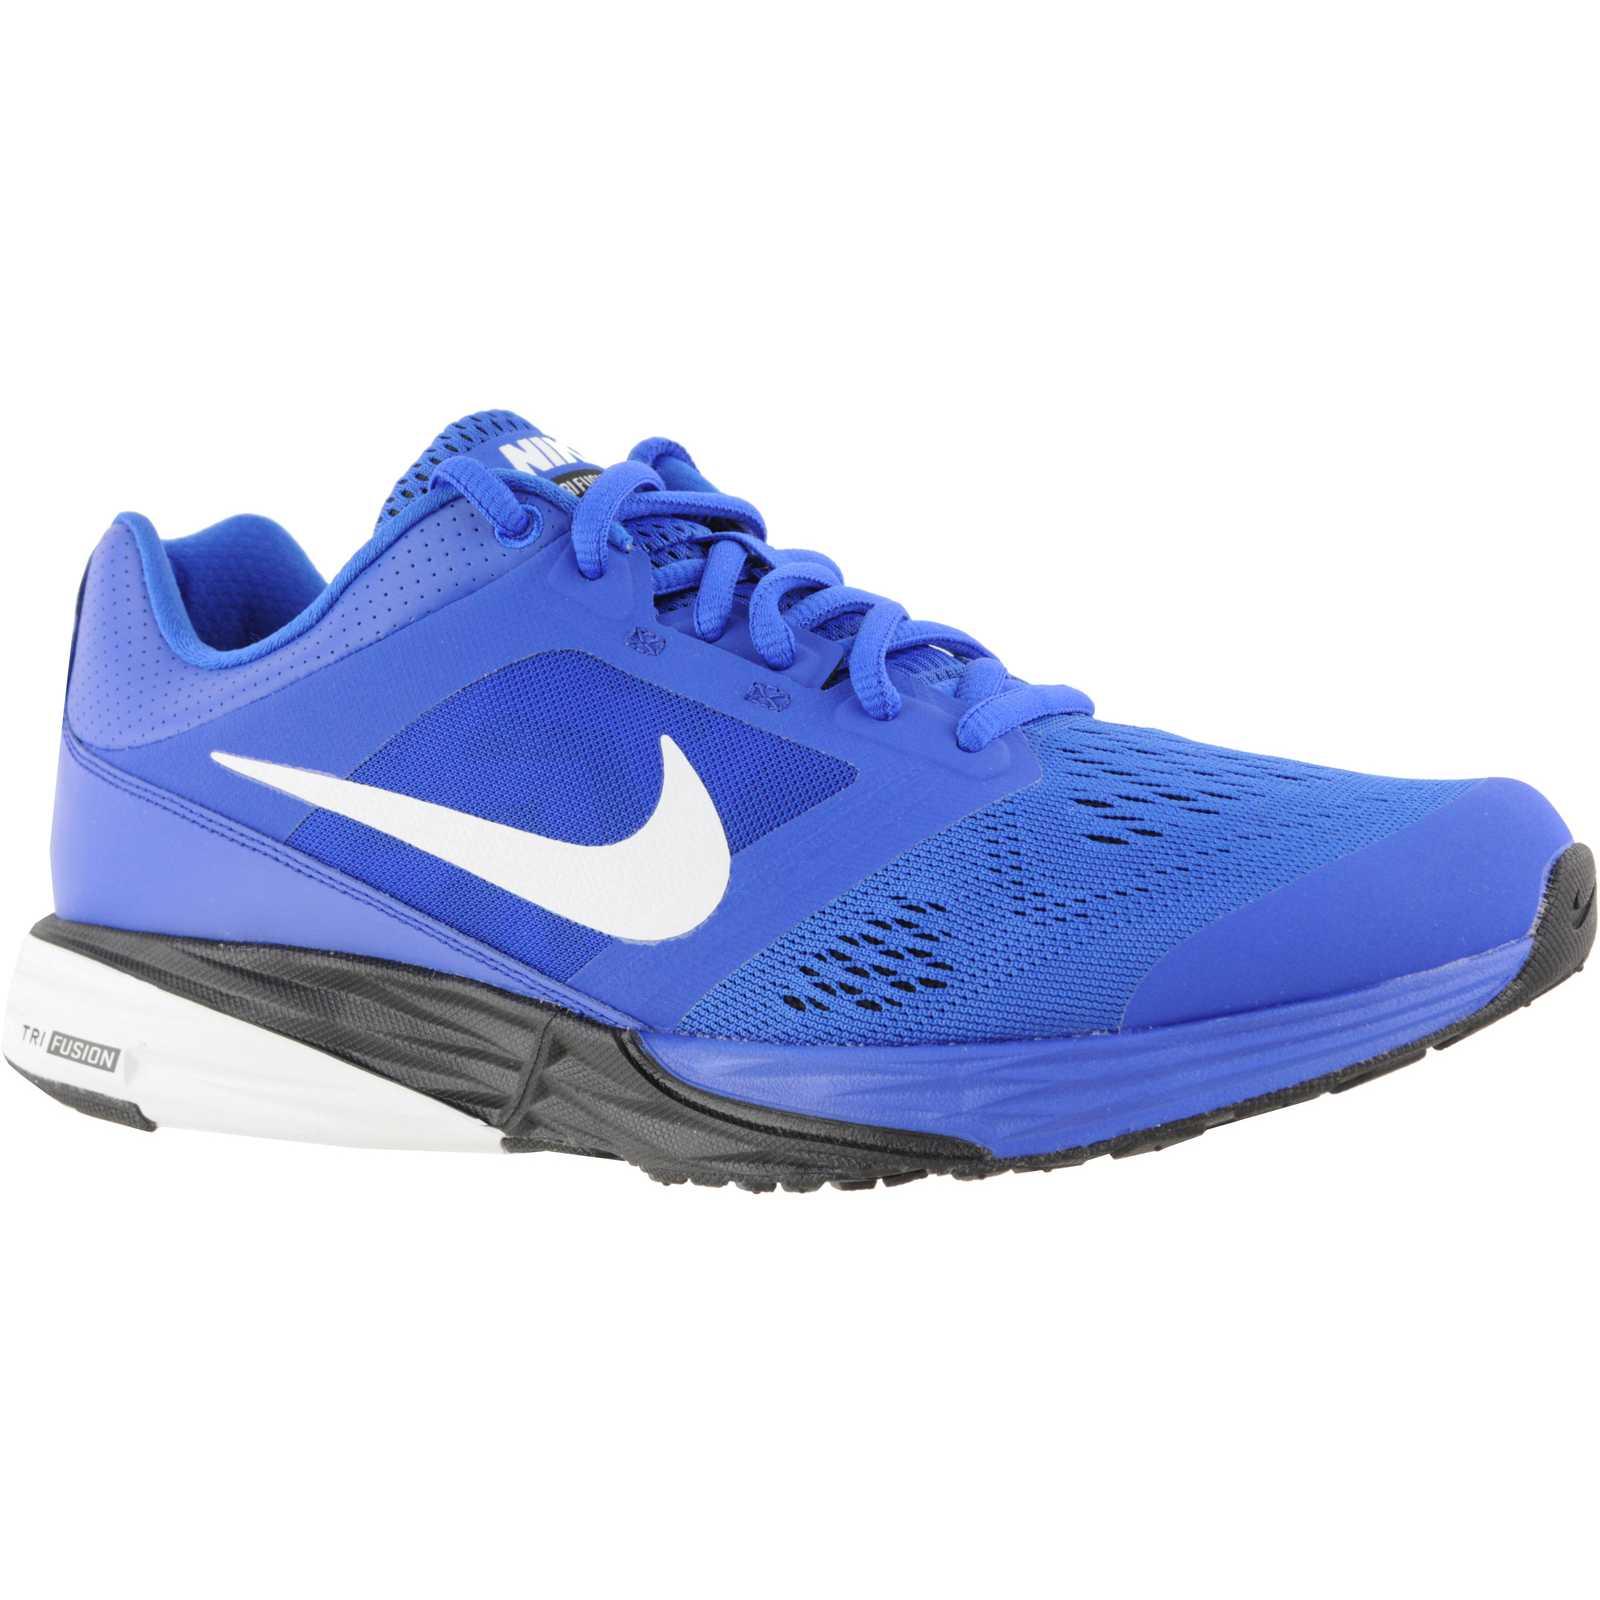 Pantofi sport barbati Nike Tri Fusion Run 749170-401